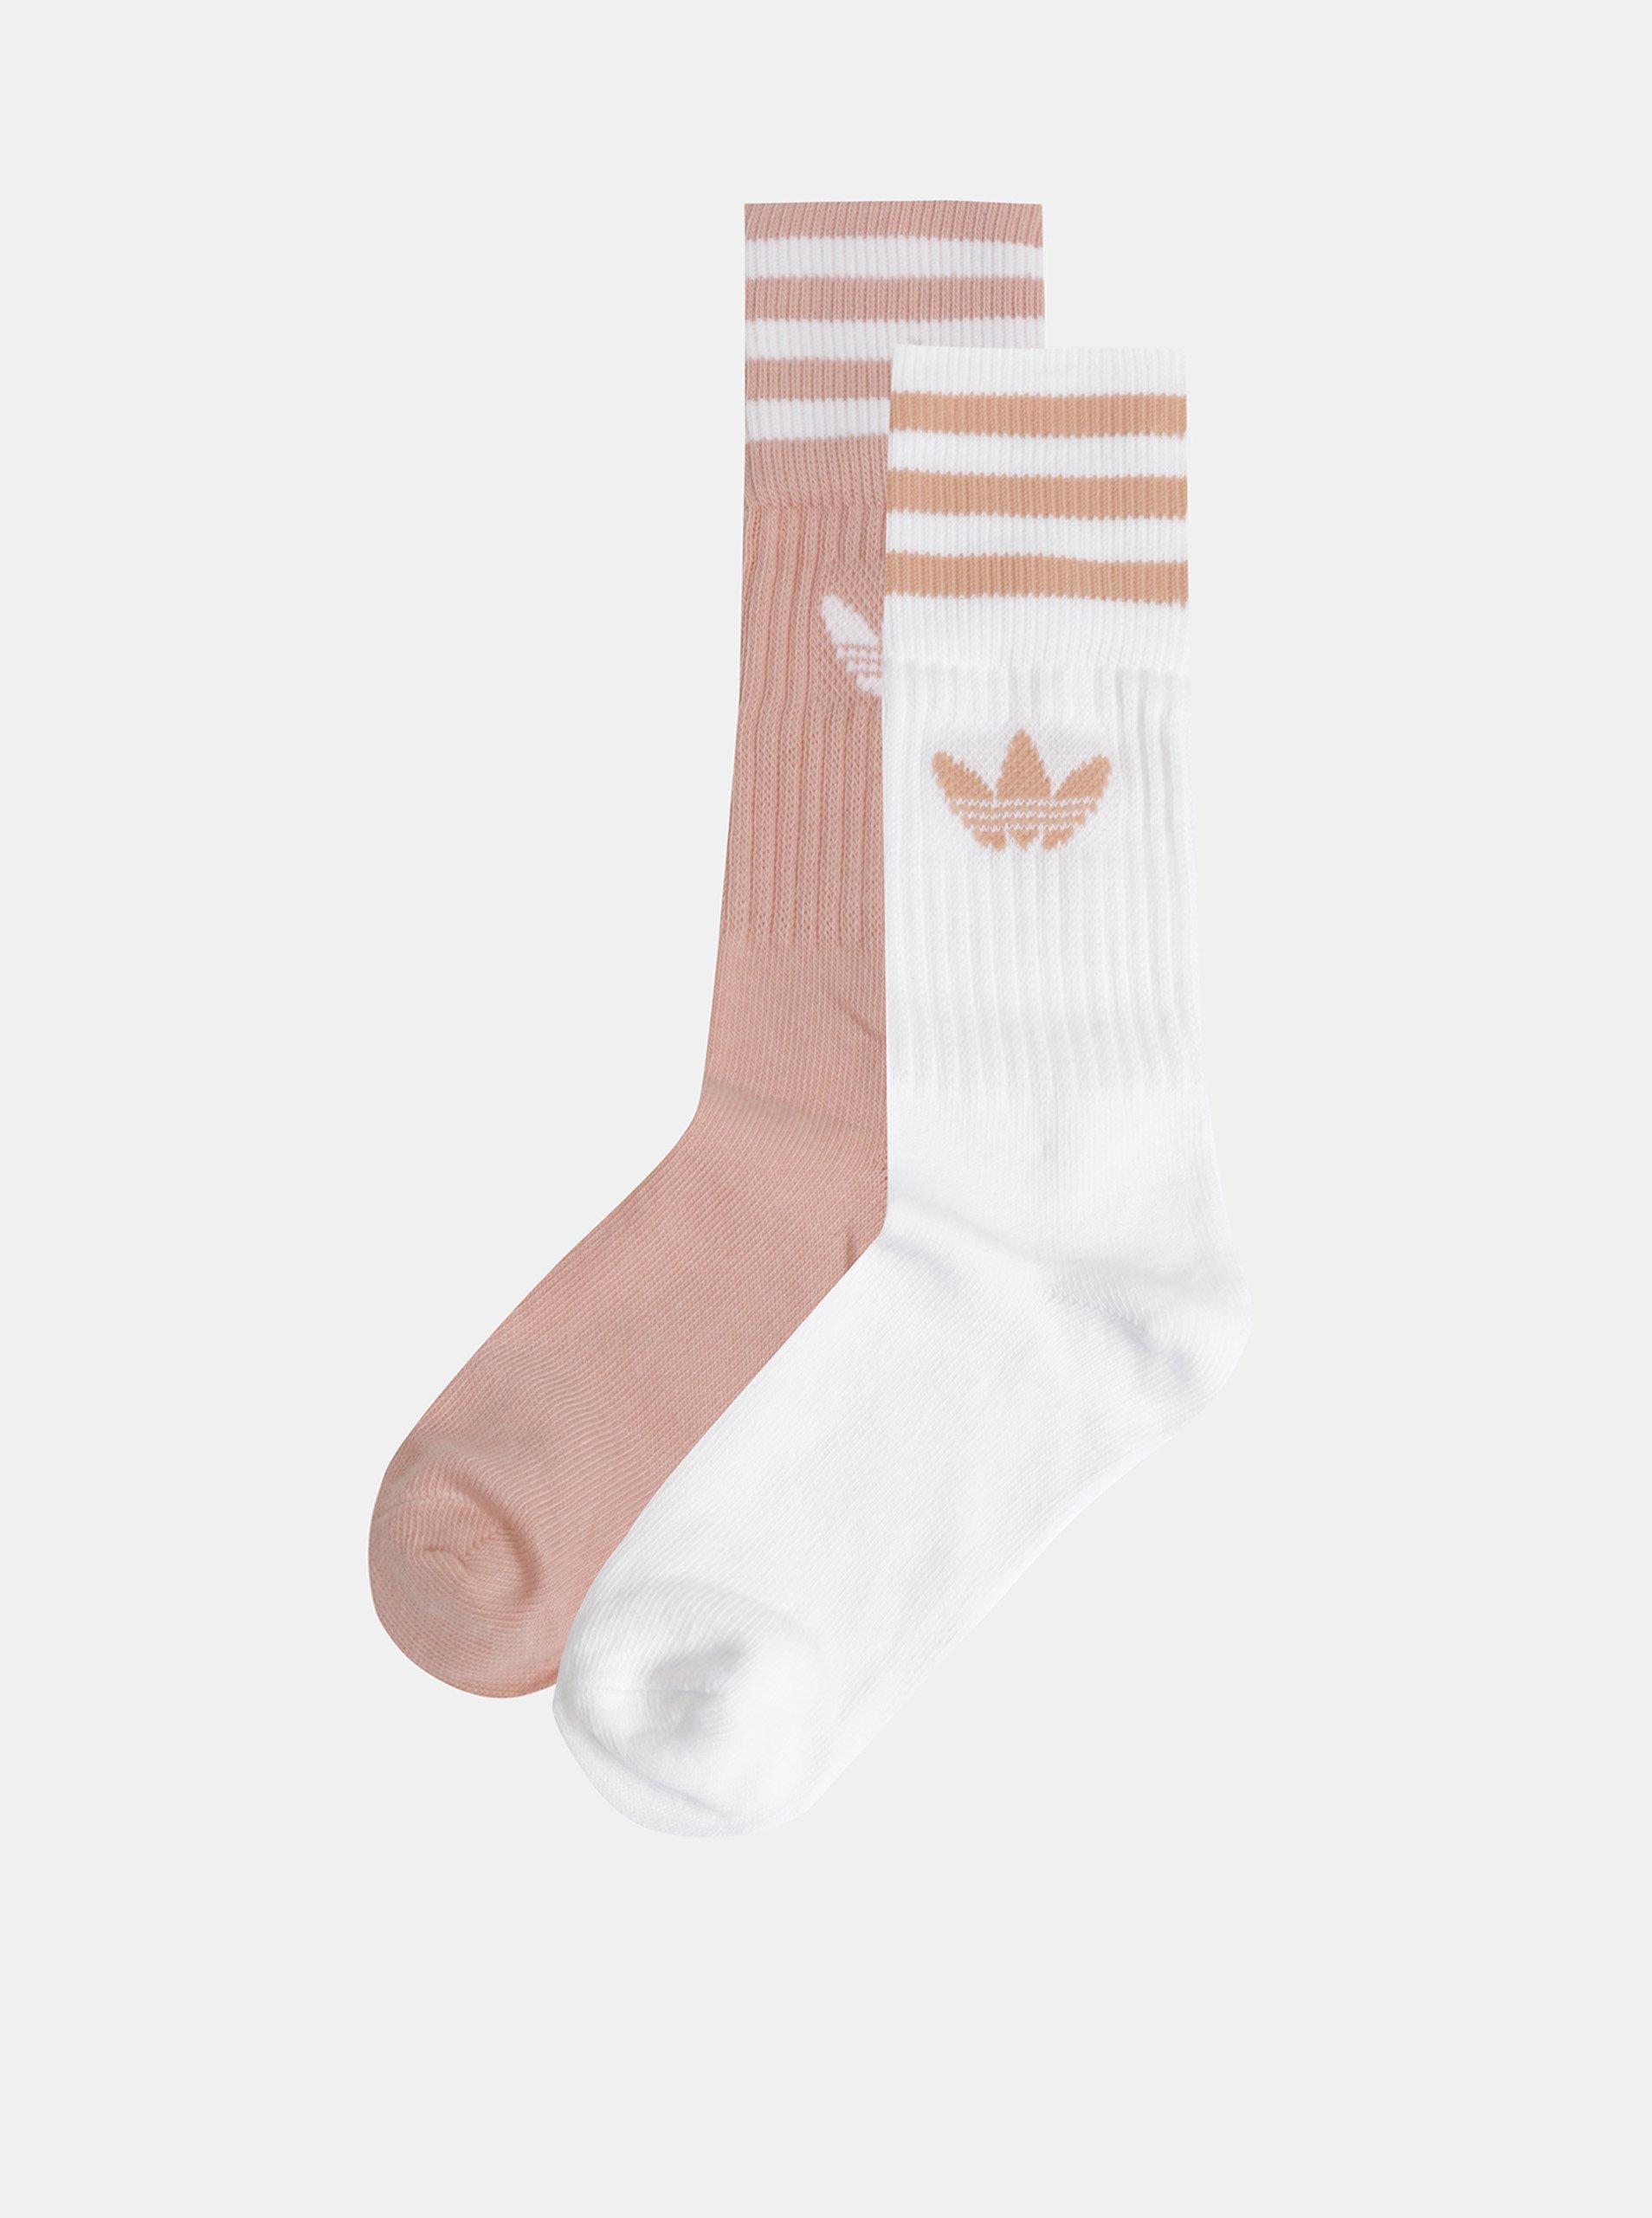 Fotografie Sada dvou párů dámských ponožek v meruňkové a bílé barvě adidas Originals Solid Crew